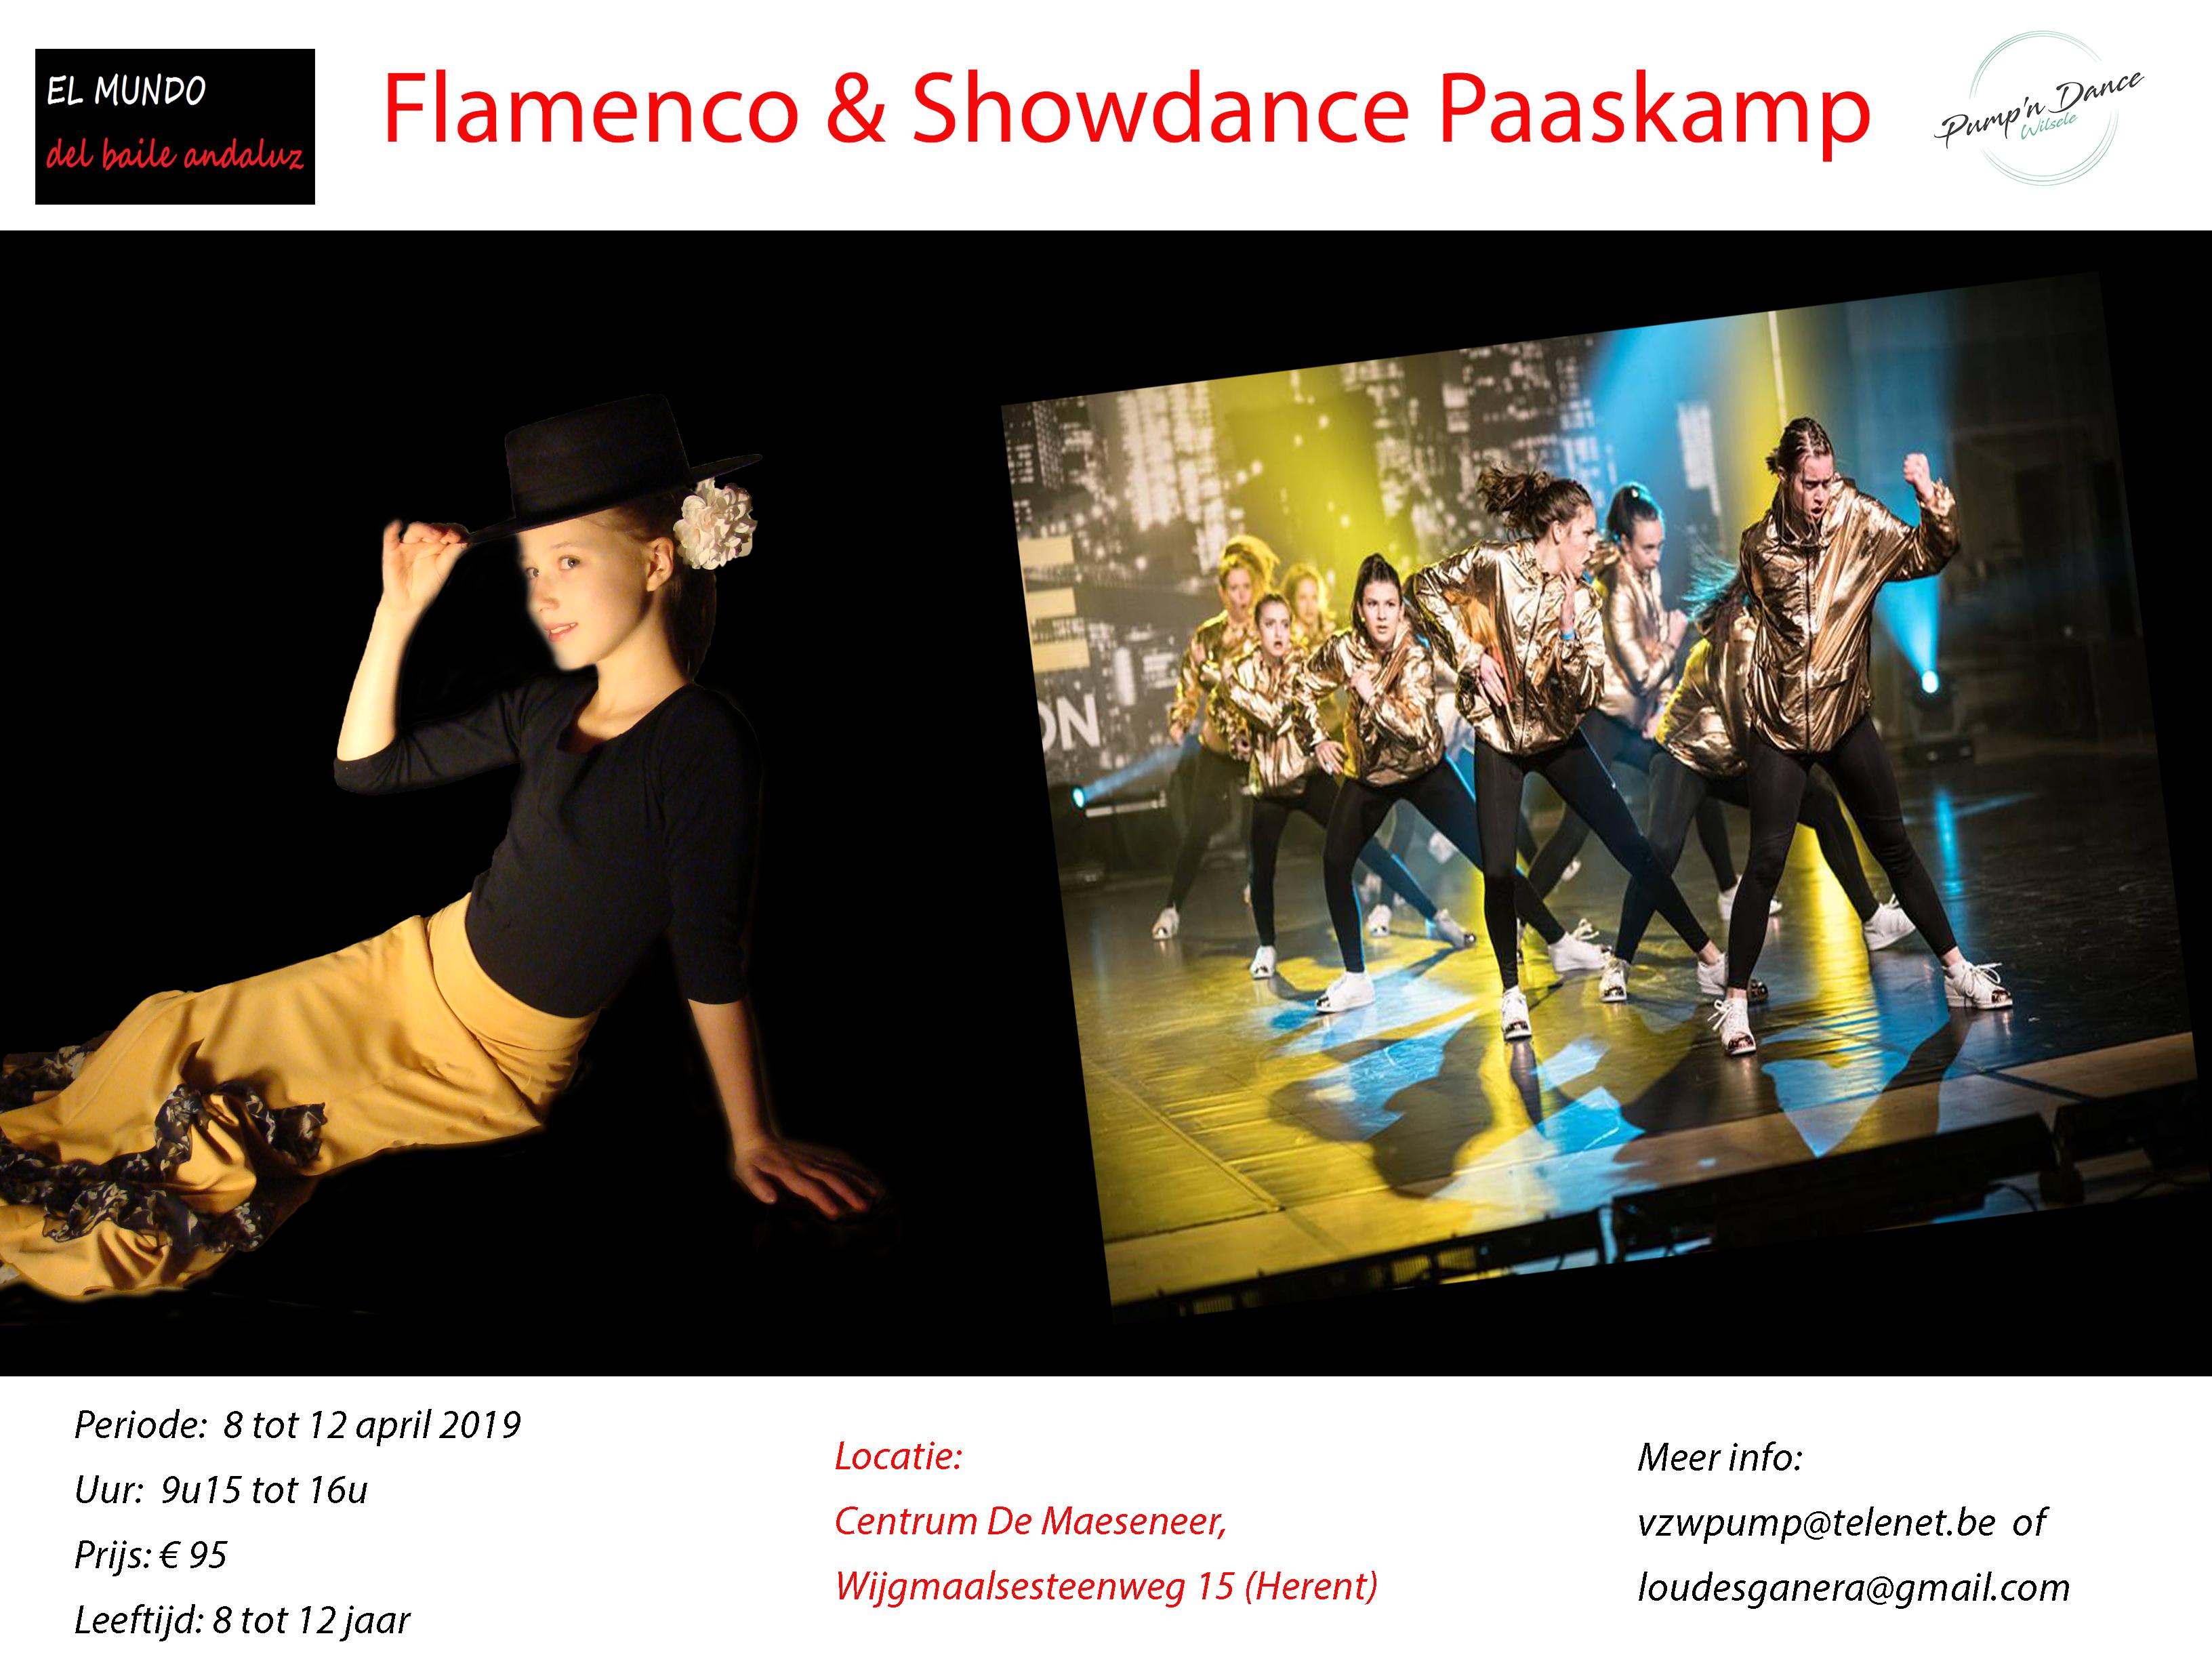 danskamp flamenco showdans